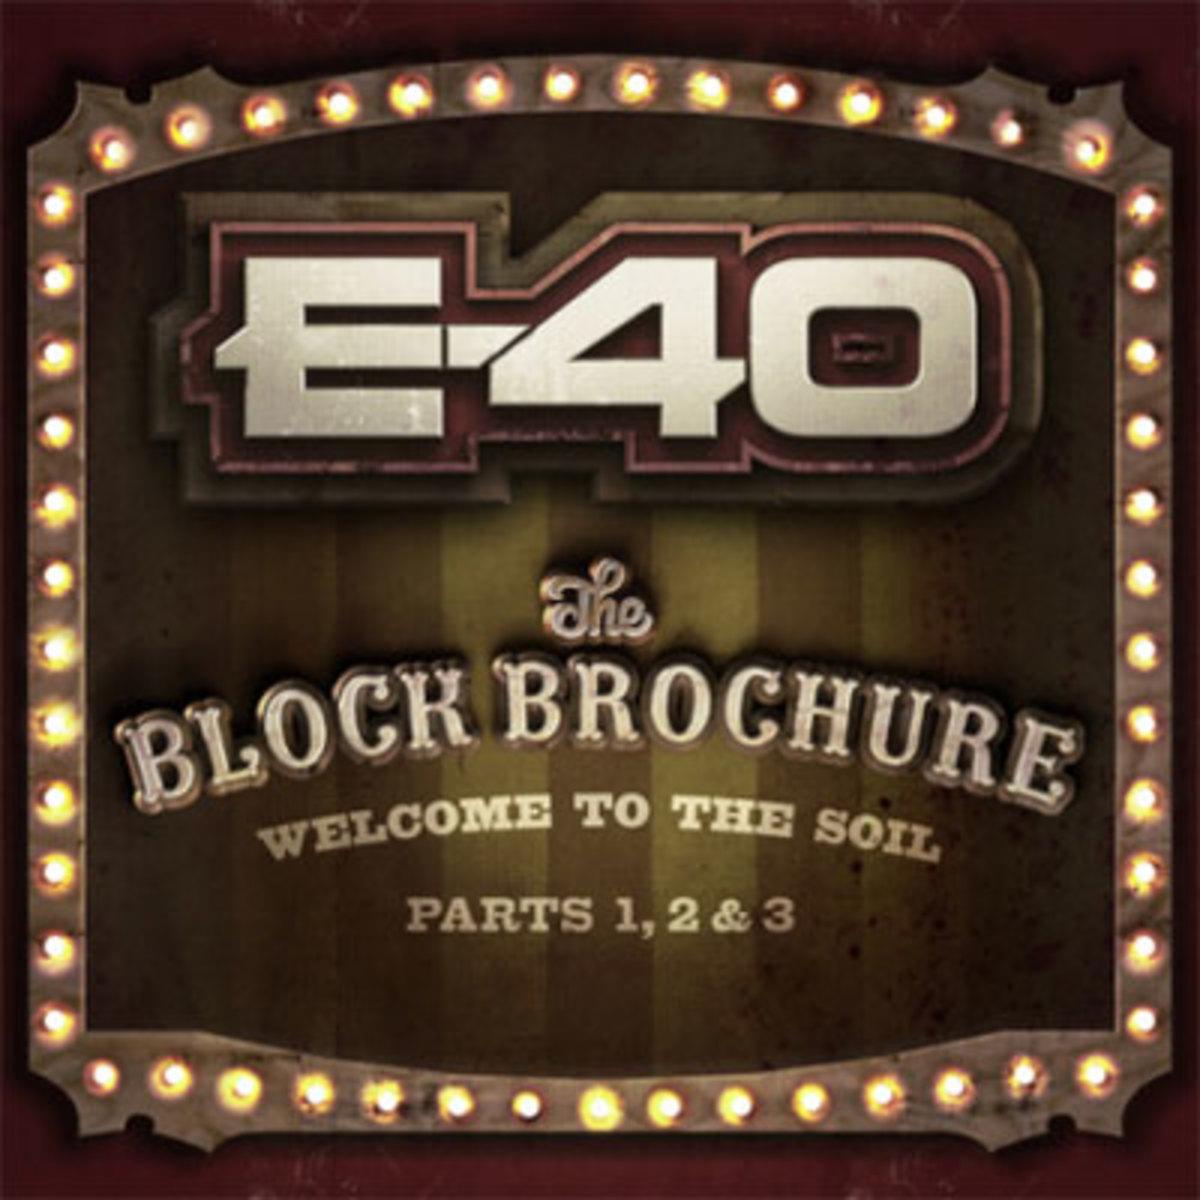 e40-blockbrochure.jpg